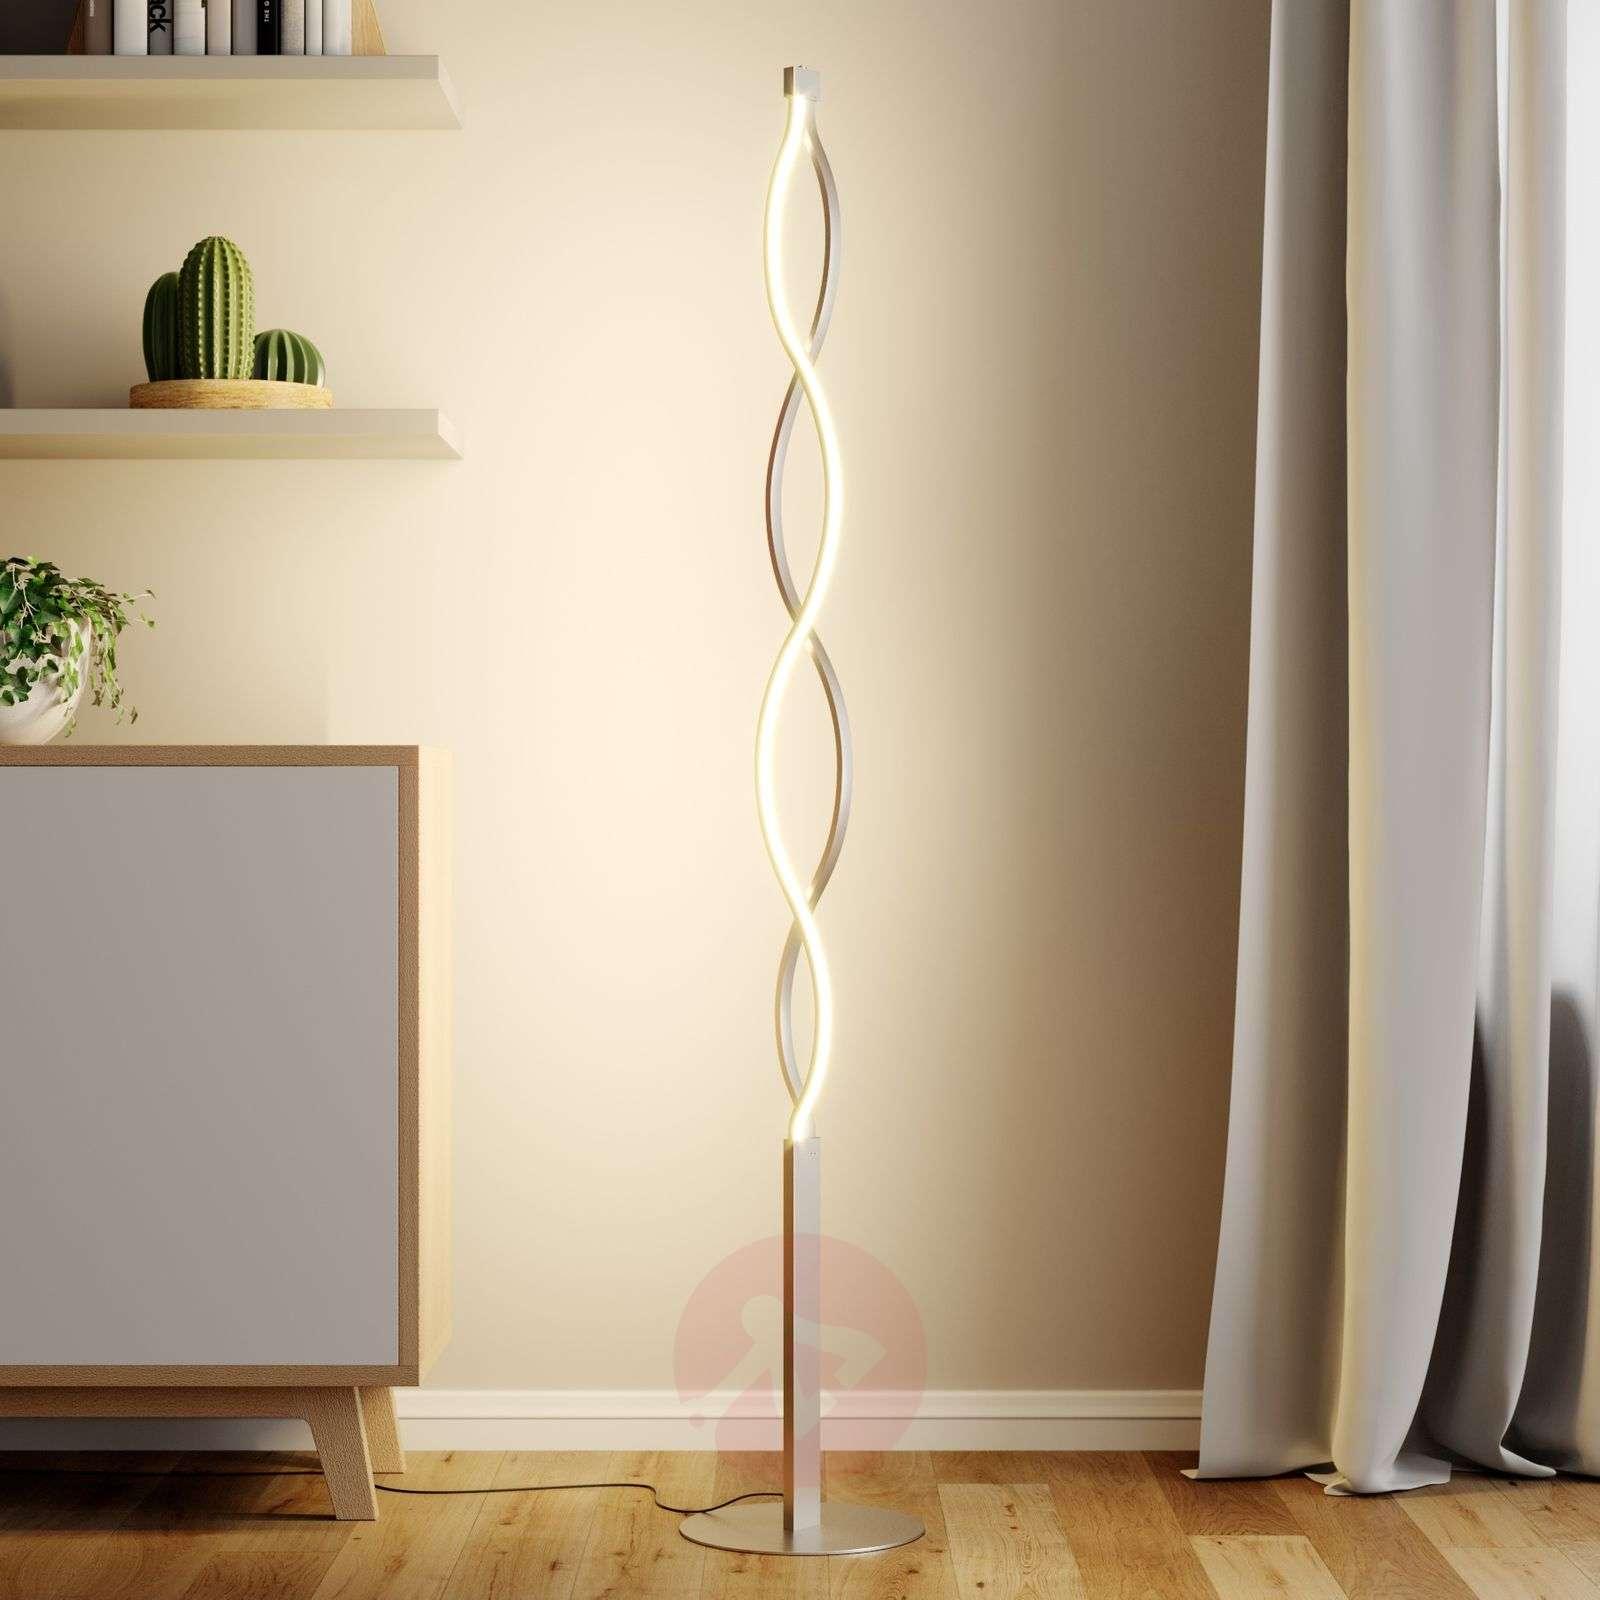 Kaunis LED-lattiavalaisin Auron-9621246-02